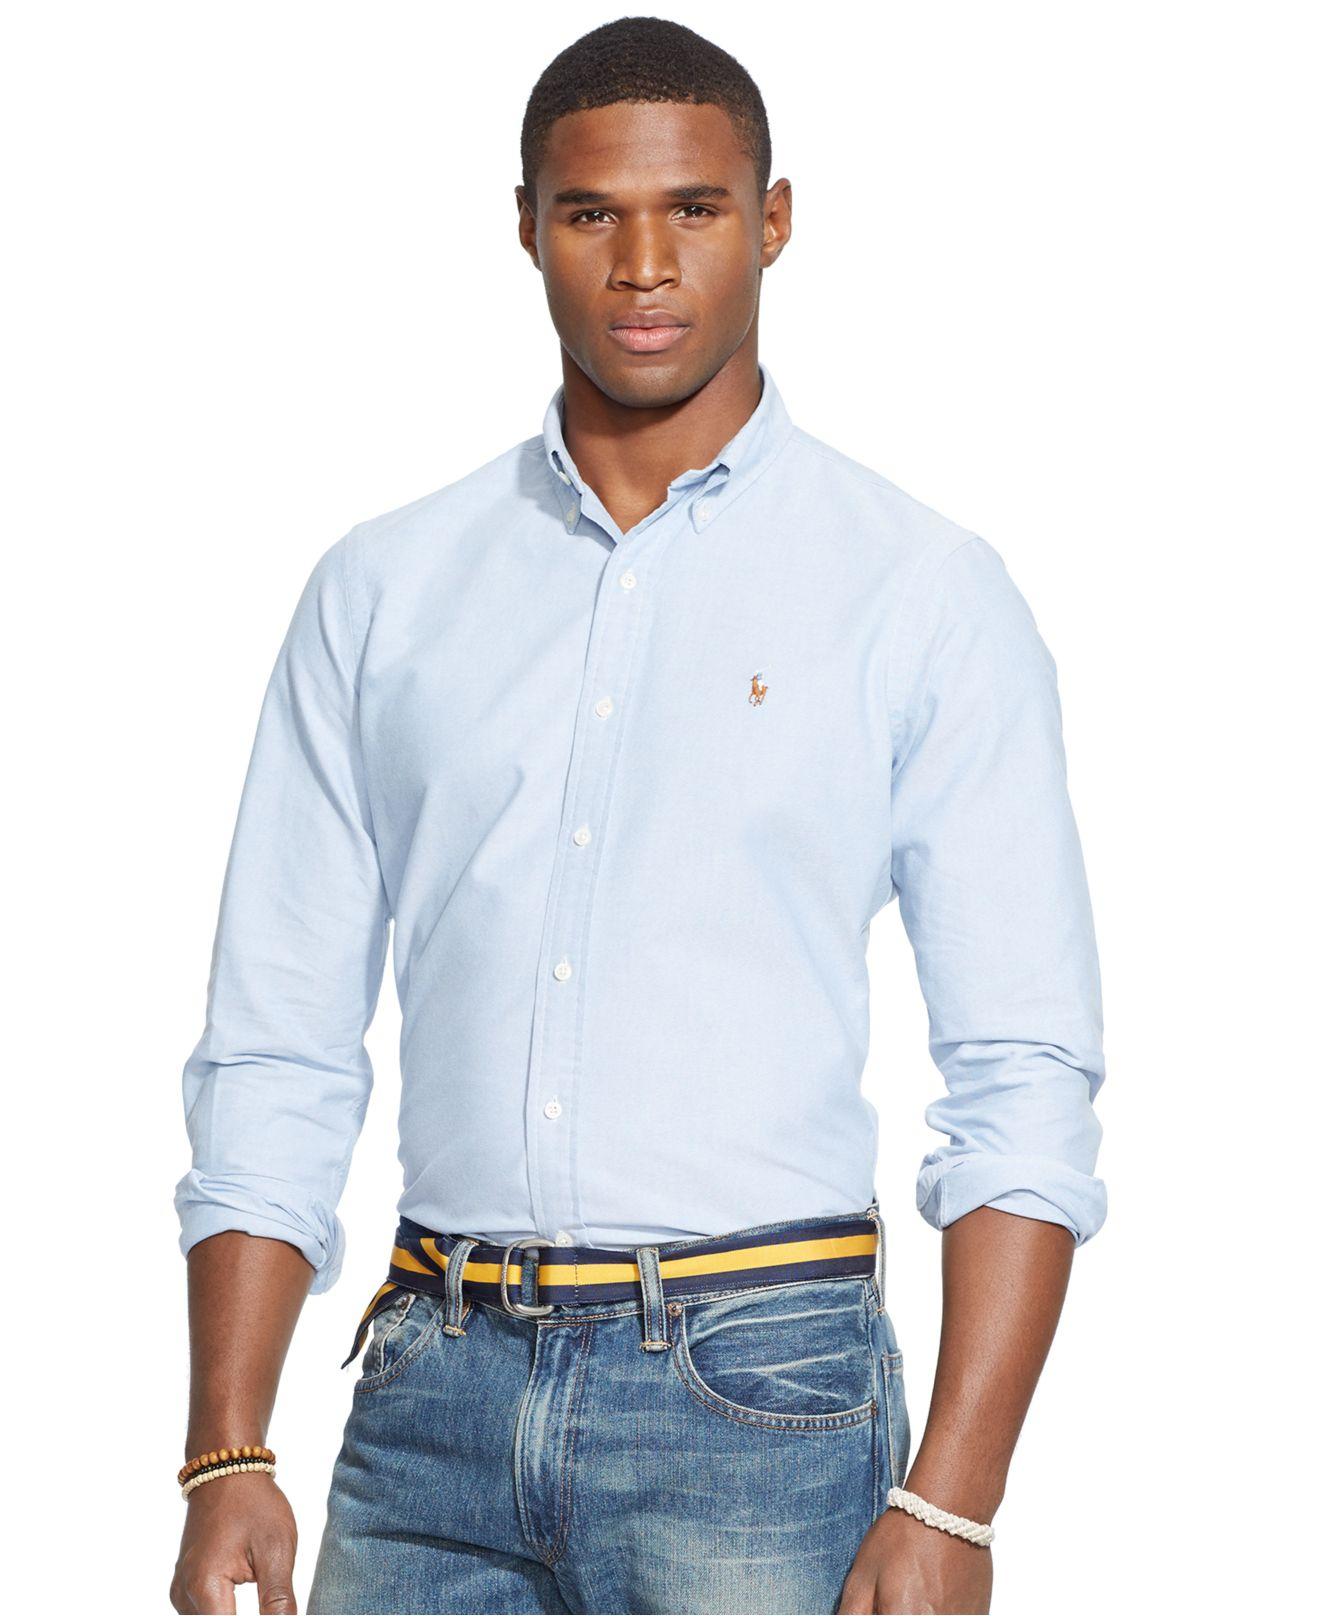 Polo ralph lauren Men's Long Sleeve Solid Oxford Shirt in ...